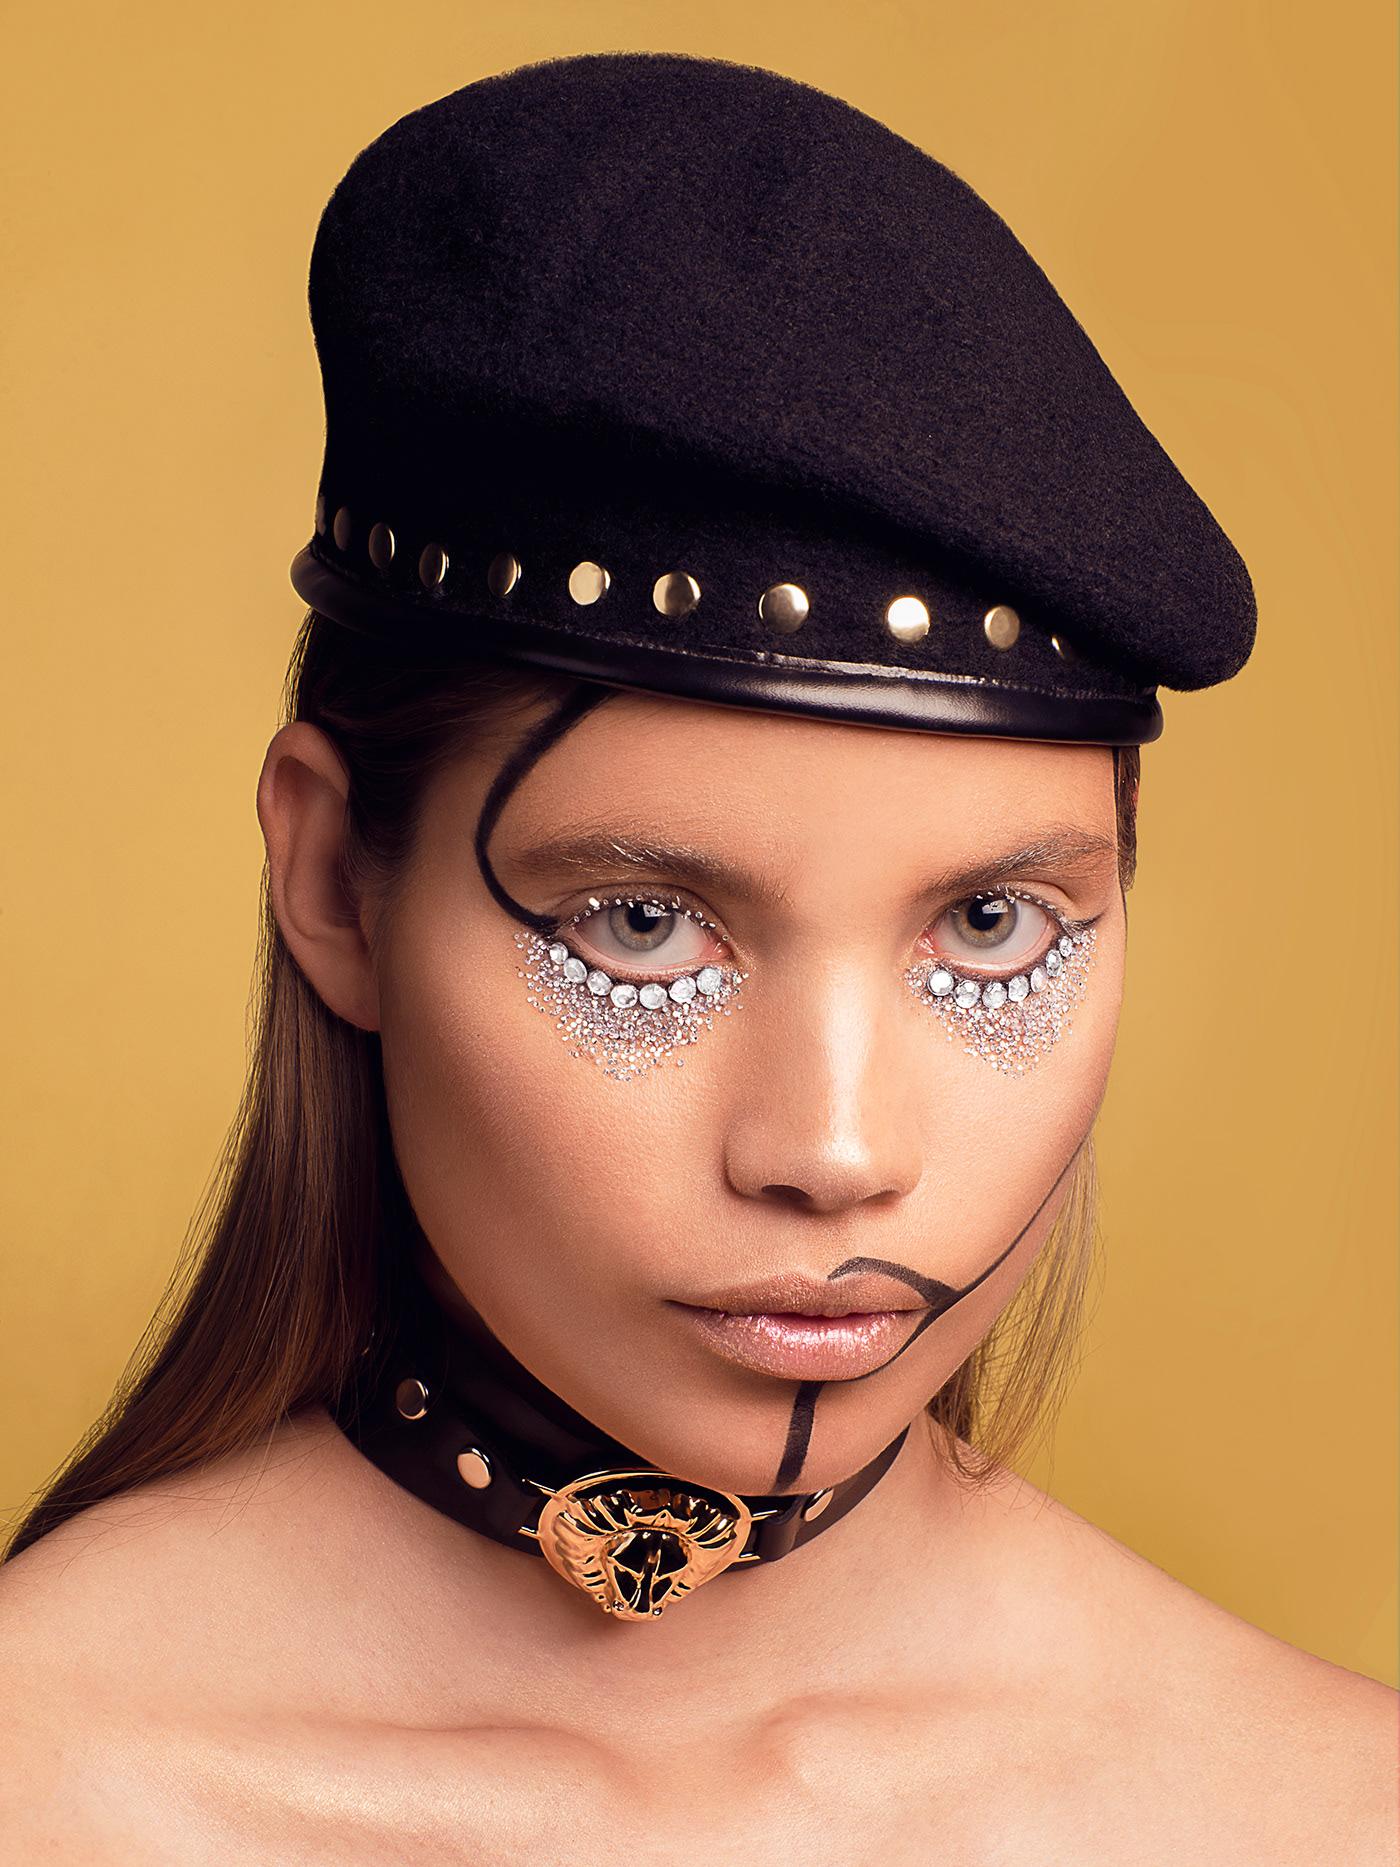 beauty diamonds editorial Fashion  High End Photography  yellow